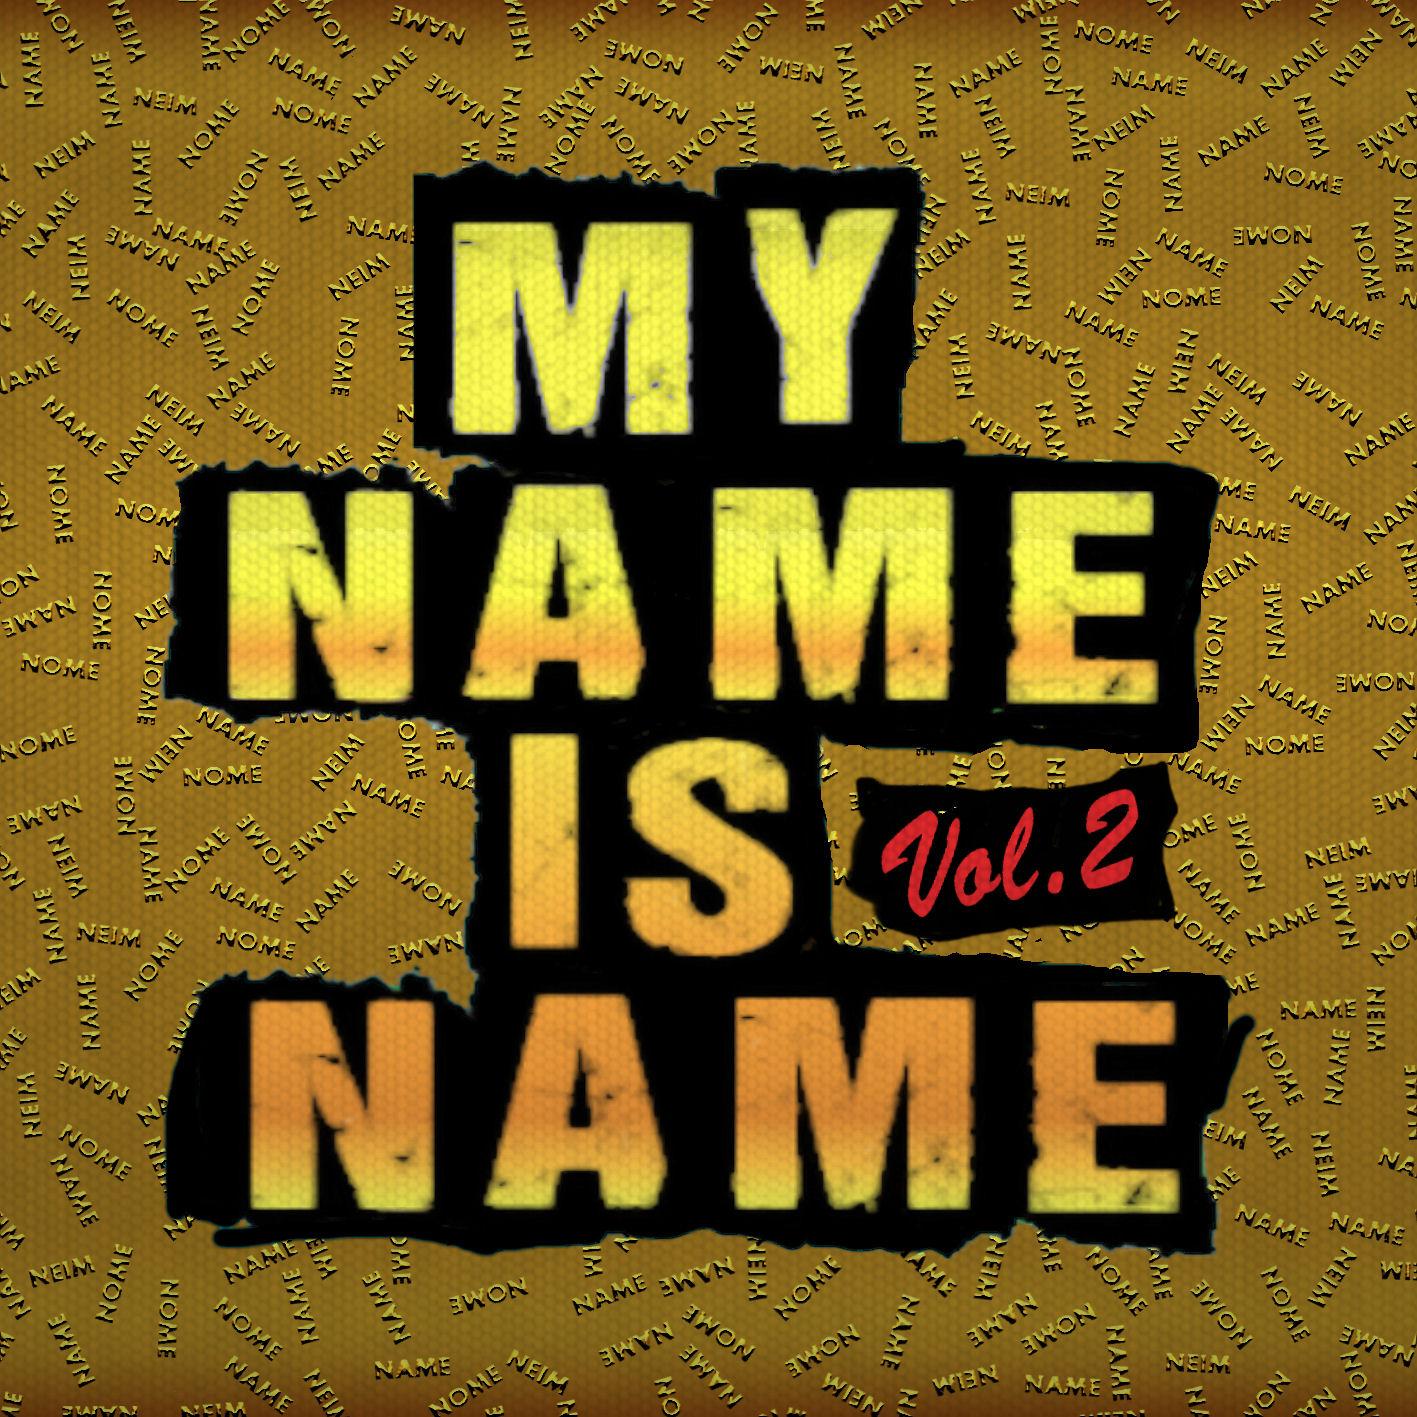 Name My Name Is Name Vol.2 Mixtape Download